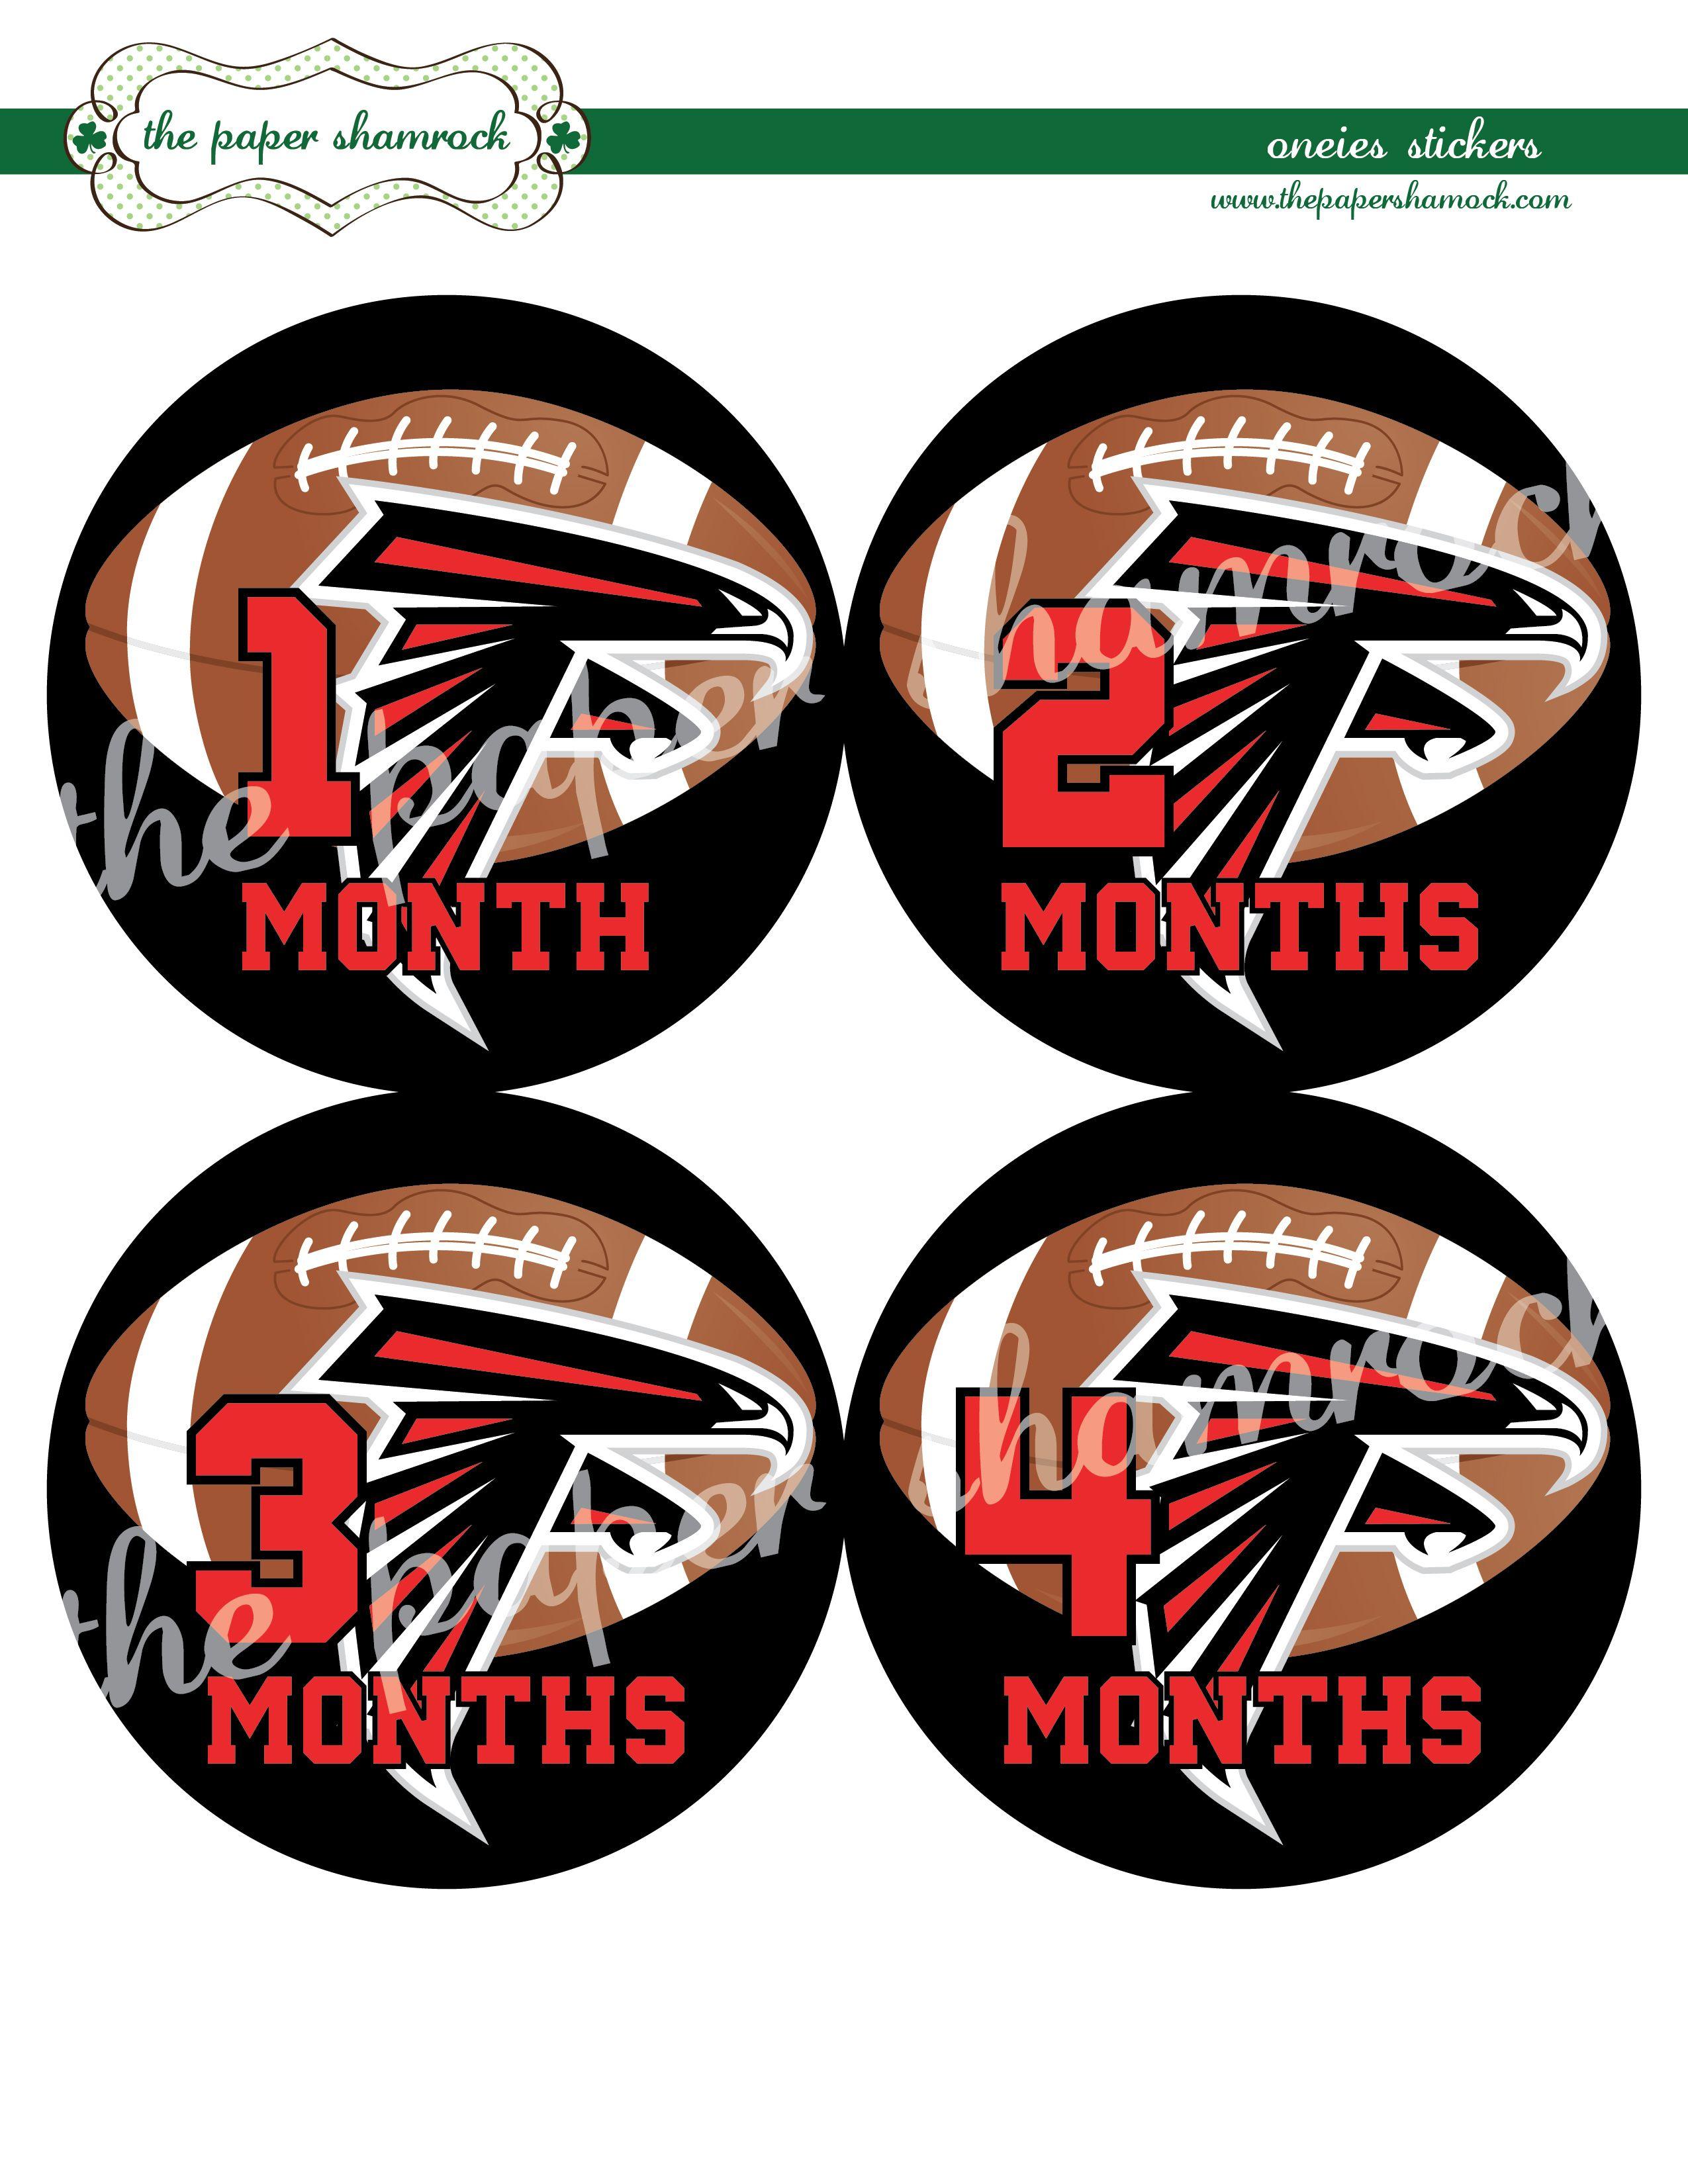 Atlanta Falcons esie Stickers I want Pinterest